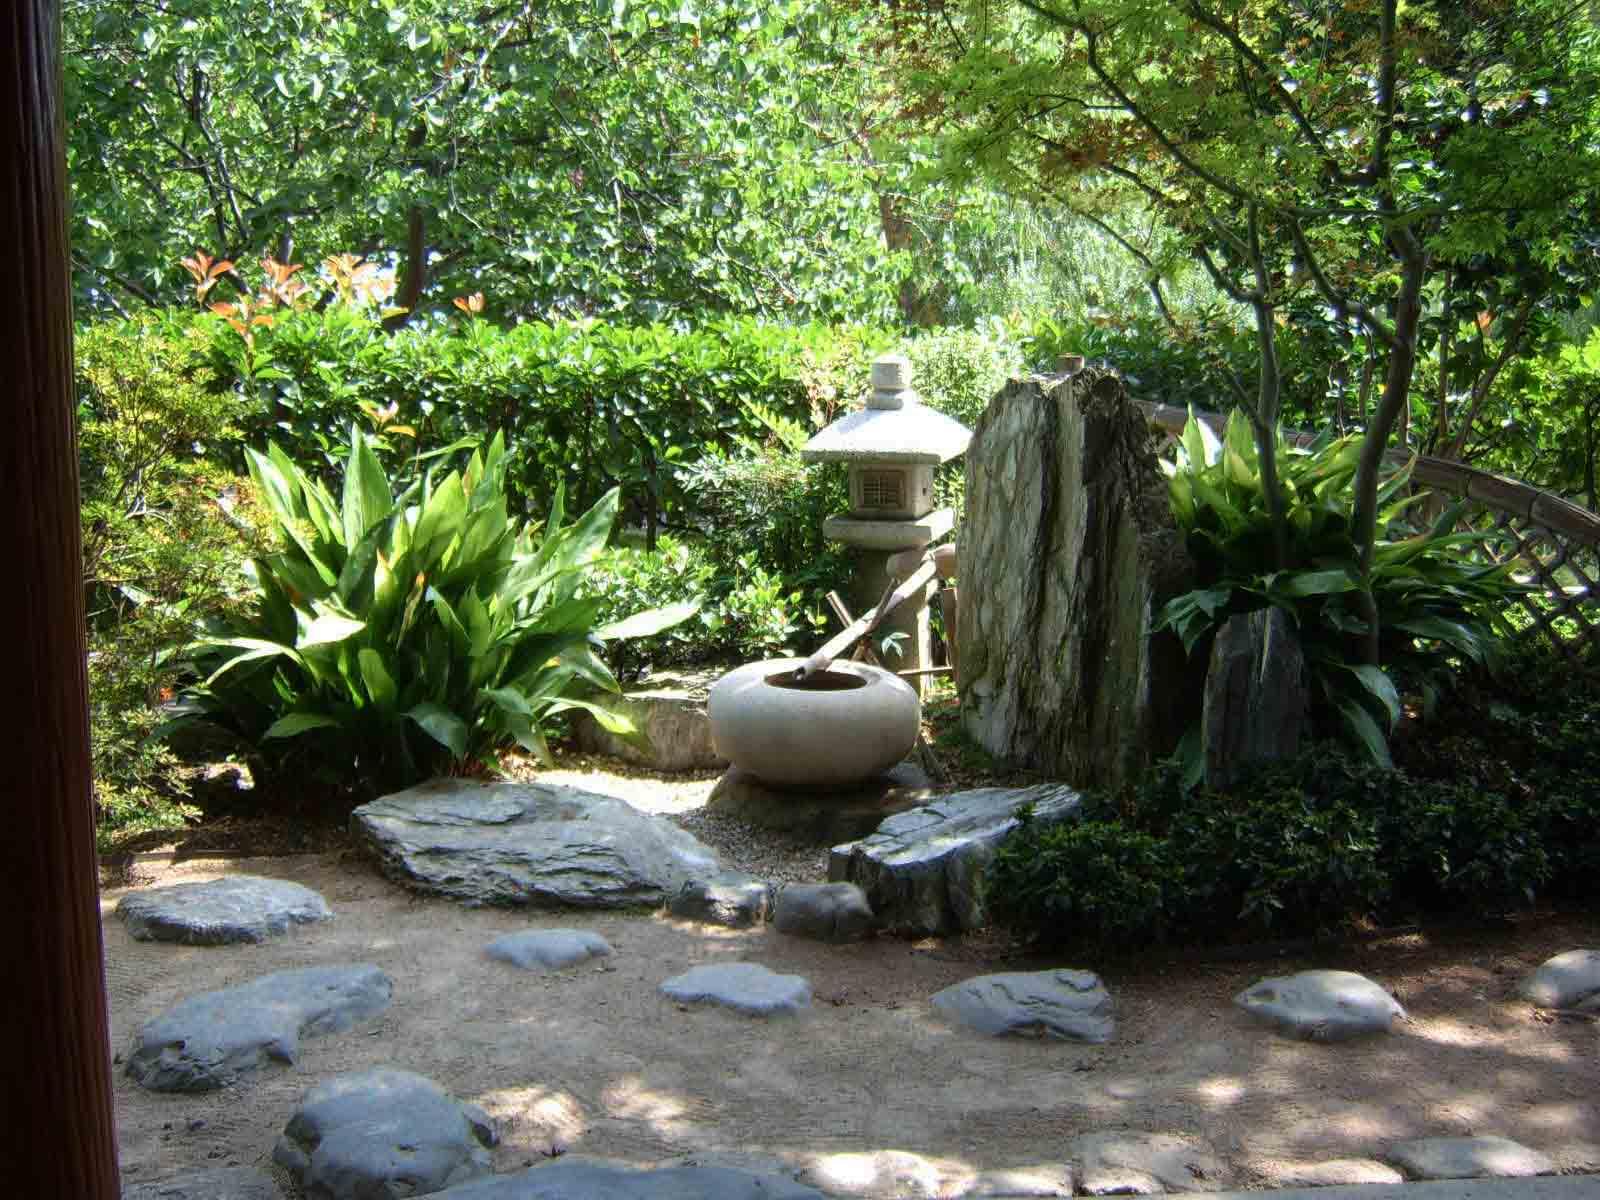 Giardino giapponese creareverde 02 creare verde - Significato giardino zen ...